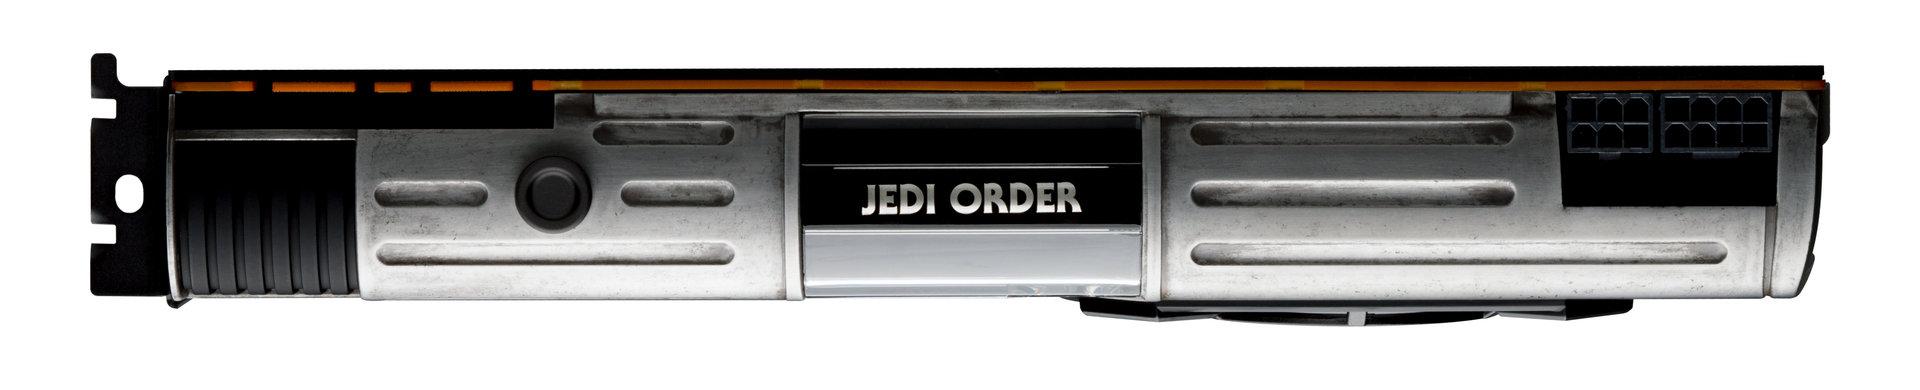 Nvidia Titan Xp Jedi Order